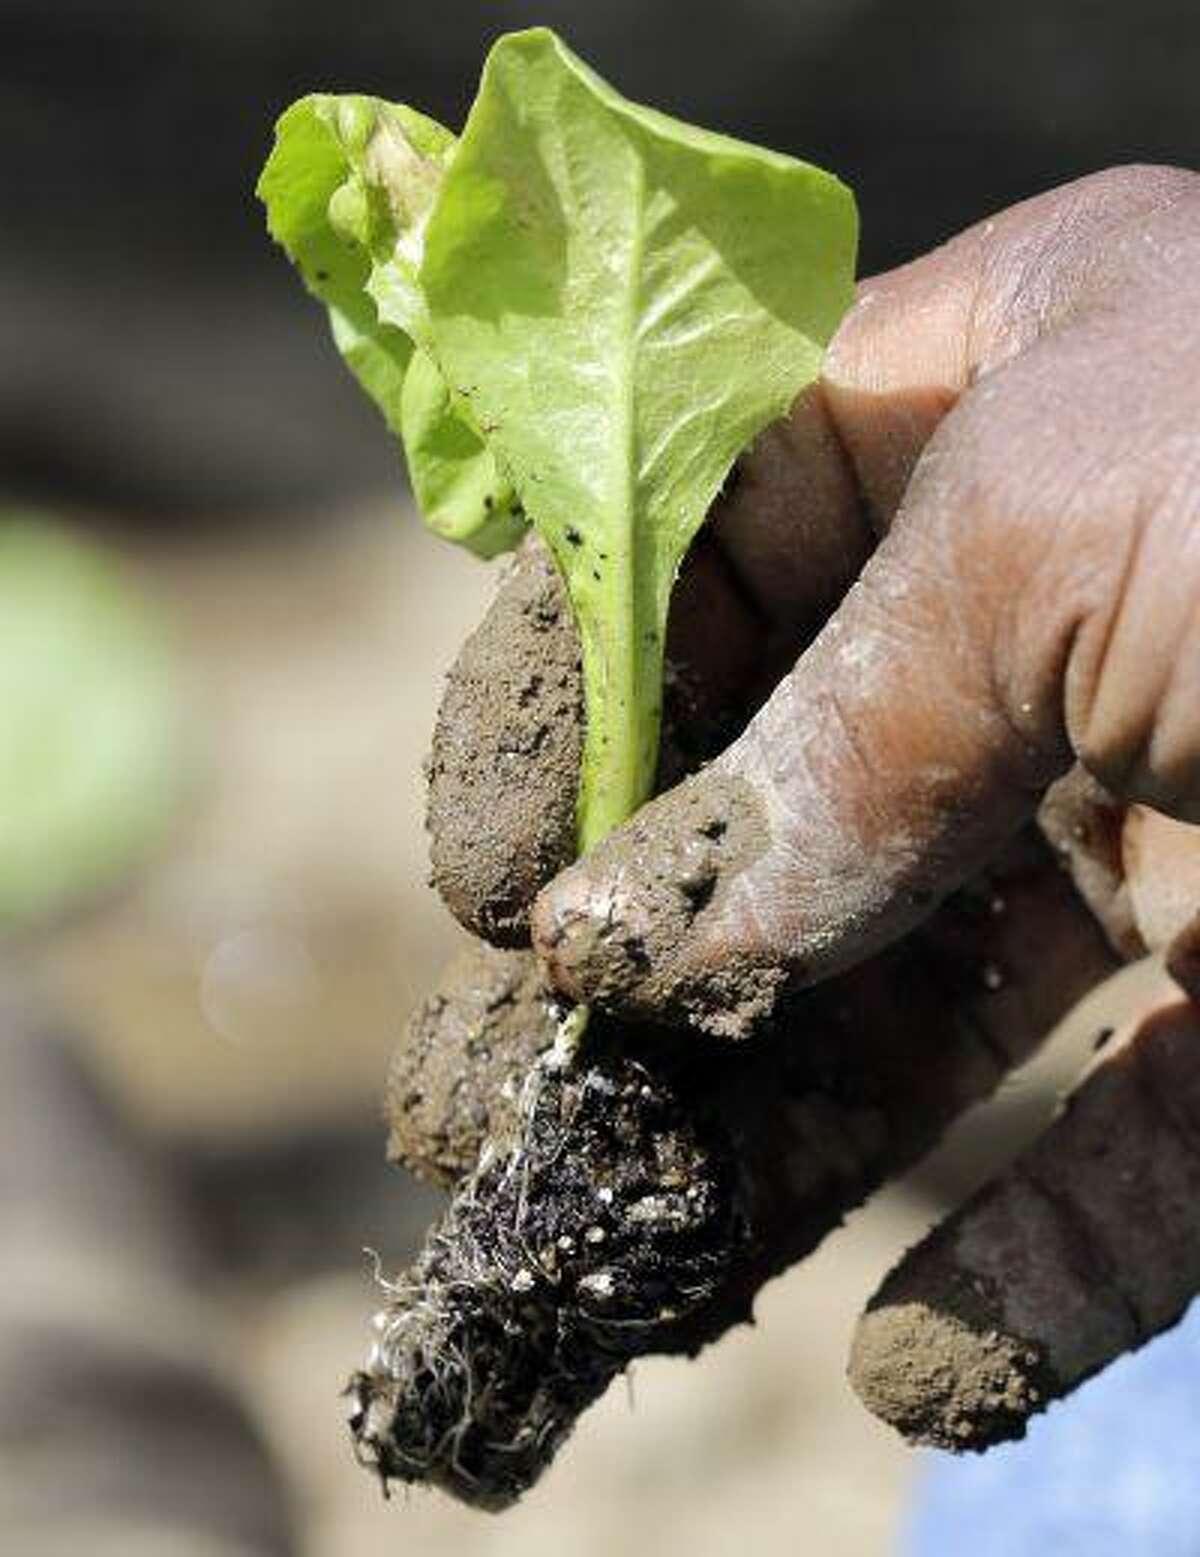 Walter Cameron transplants a lettuce plant in a field at Denison Farm on Monday, Aug. 12, 2013, in Schaghticoke, N.Y.